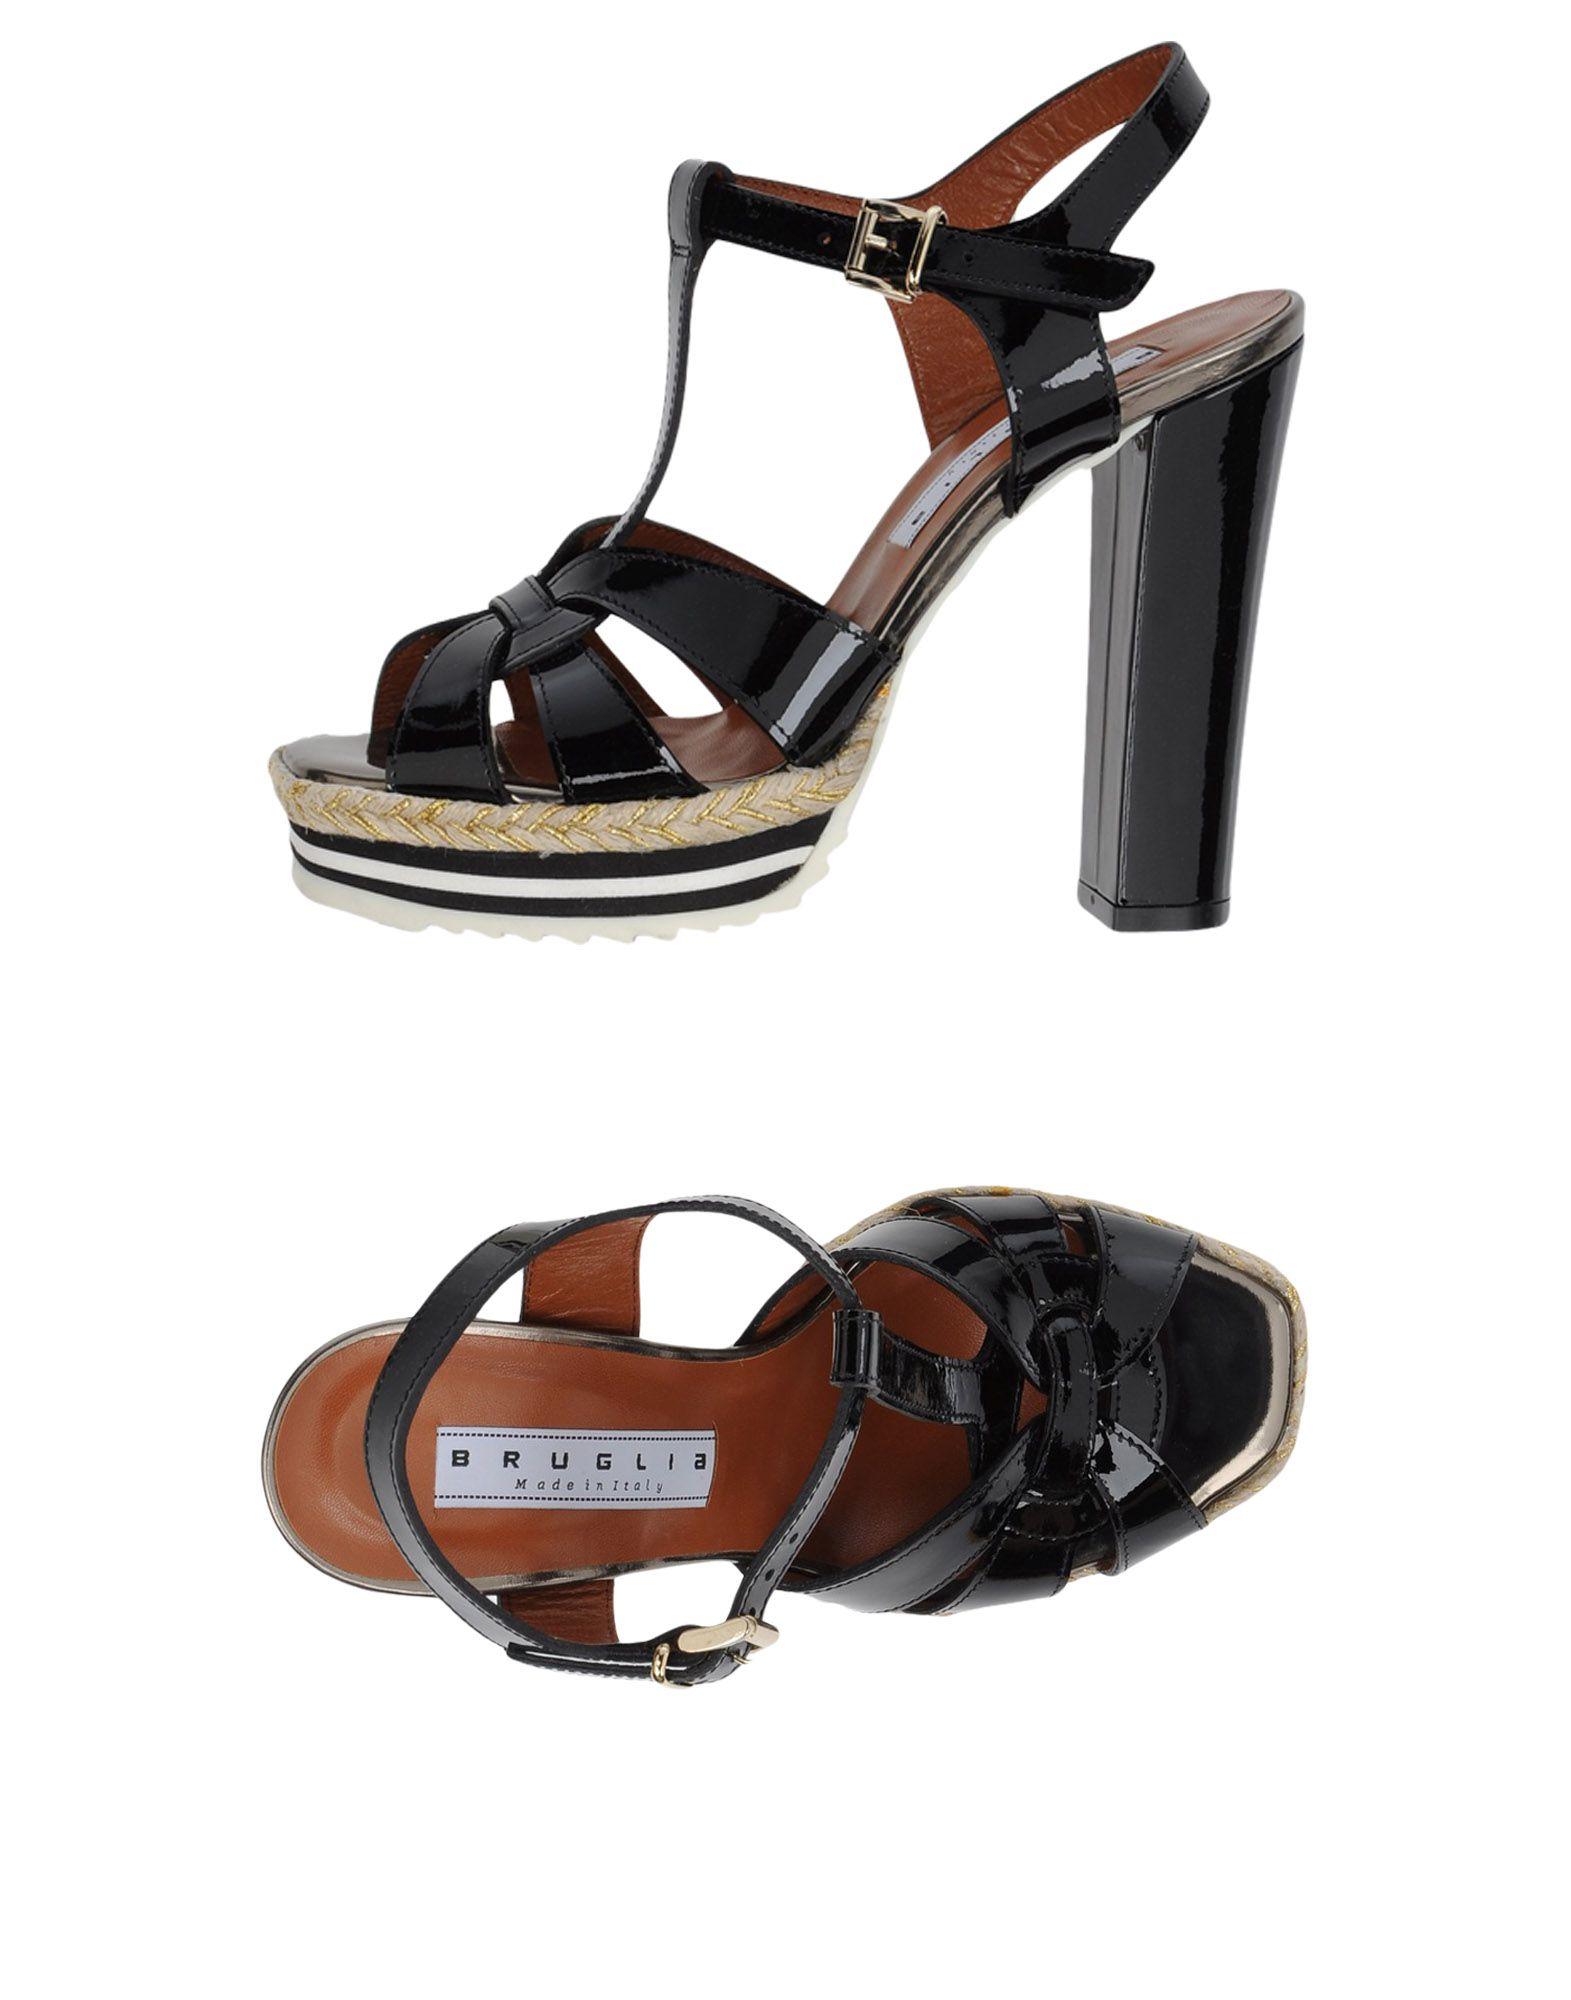 F.Lli 11345598GI Bruglia Sandalen Damen  11345598GI F.Lli Gute Qualität beliebte Schuhe 324b4c